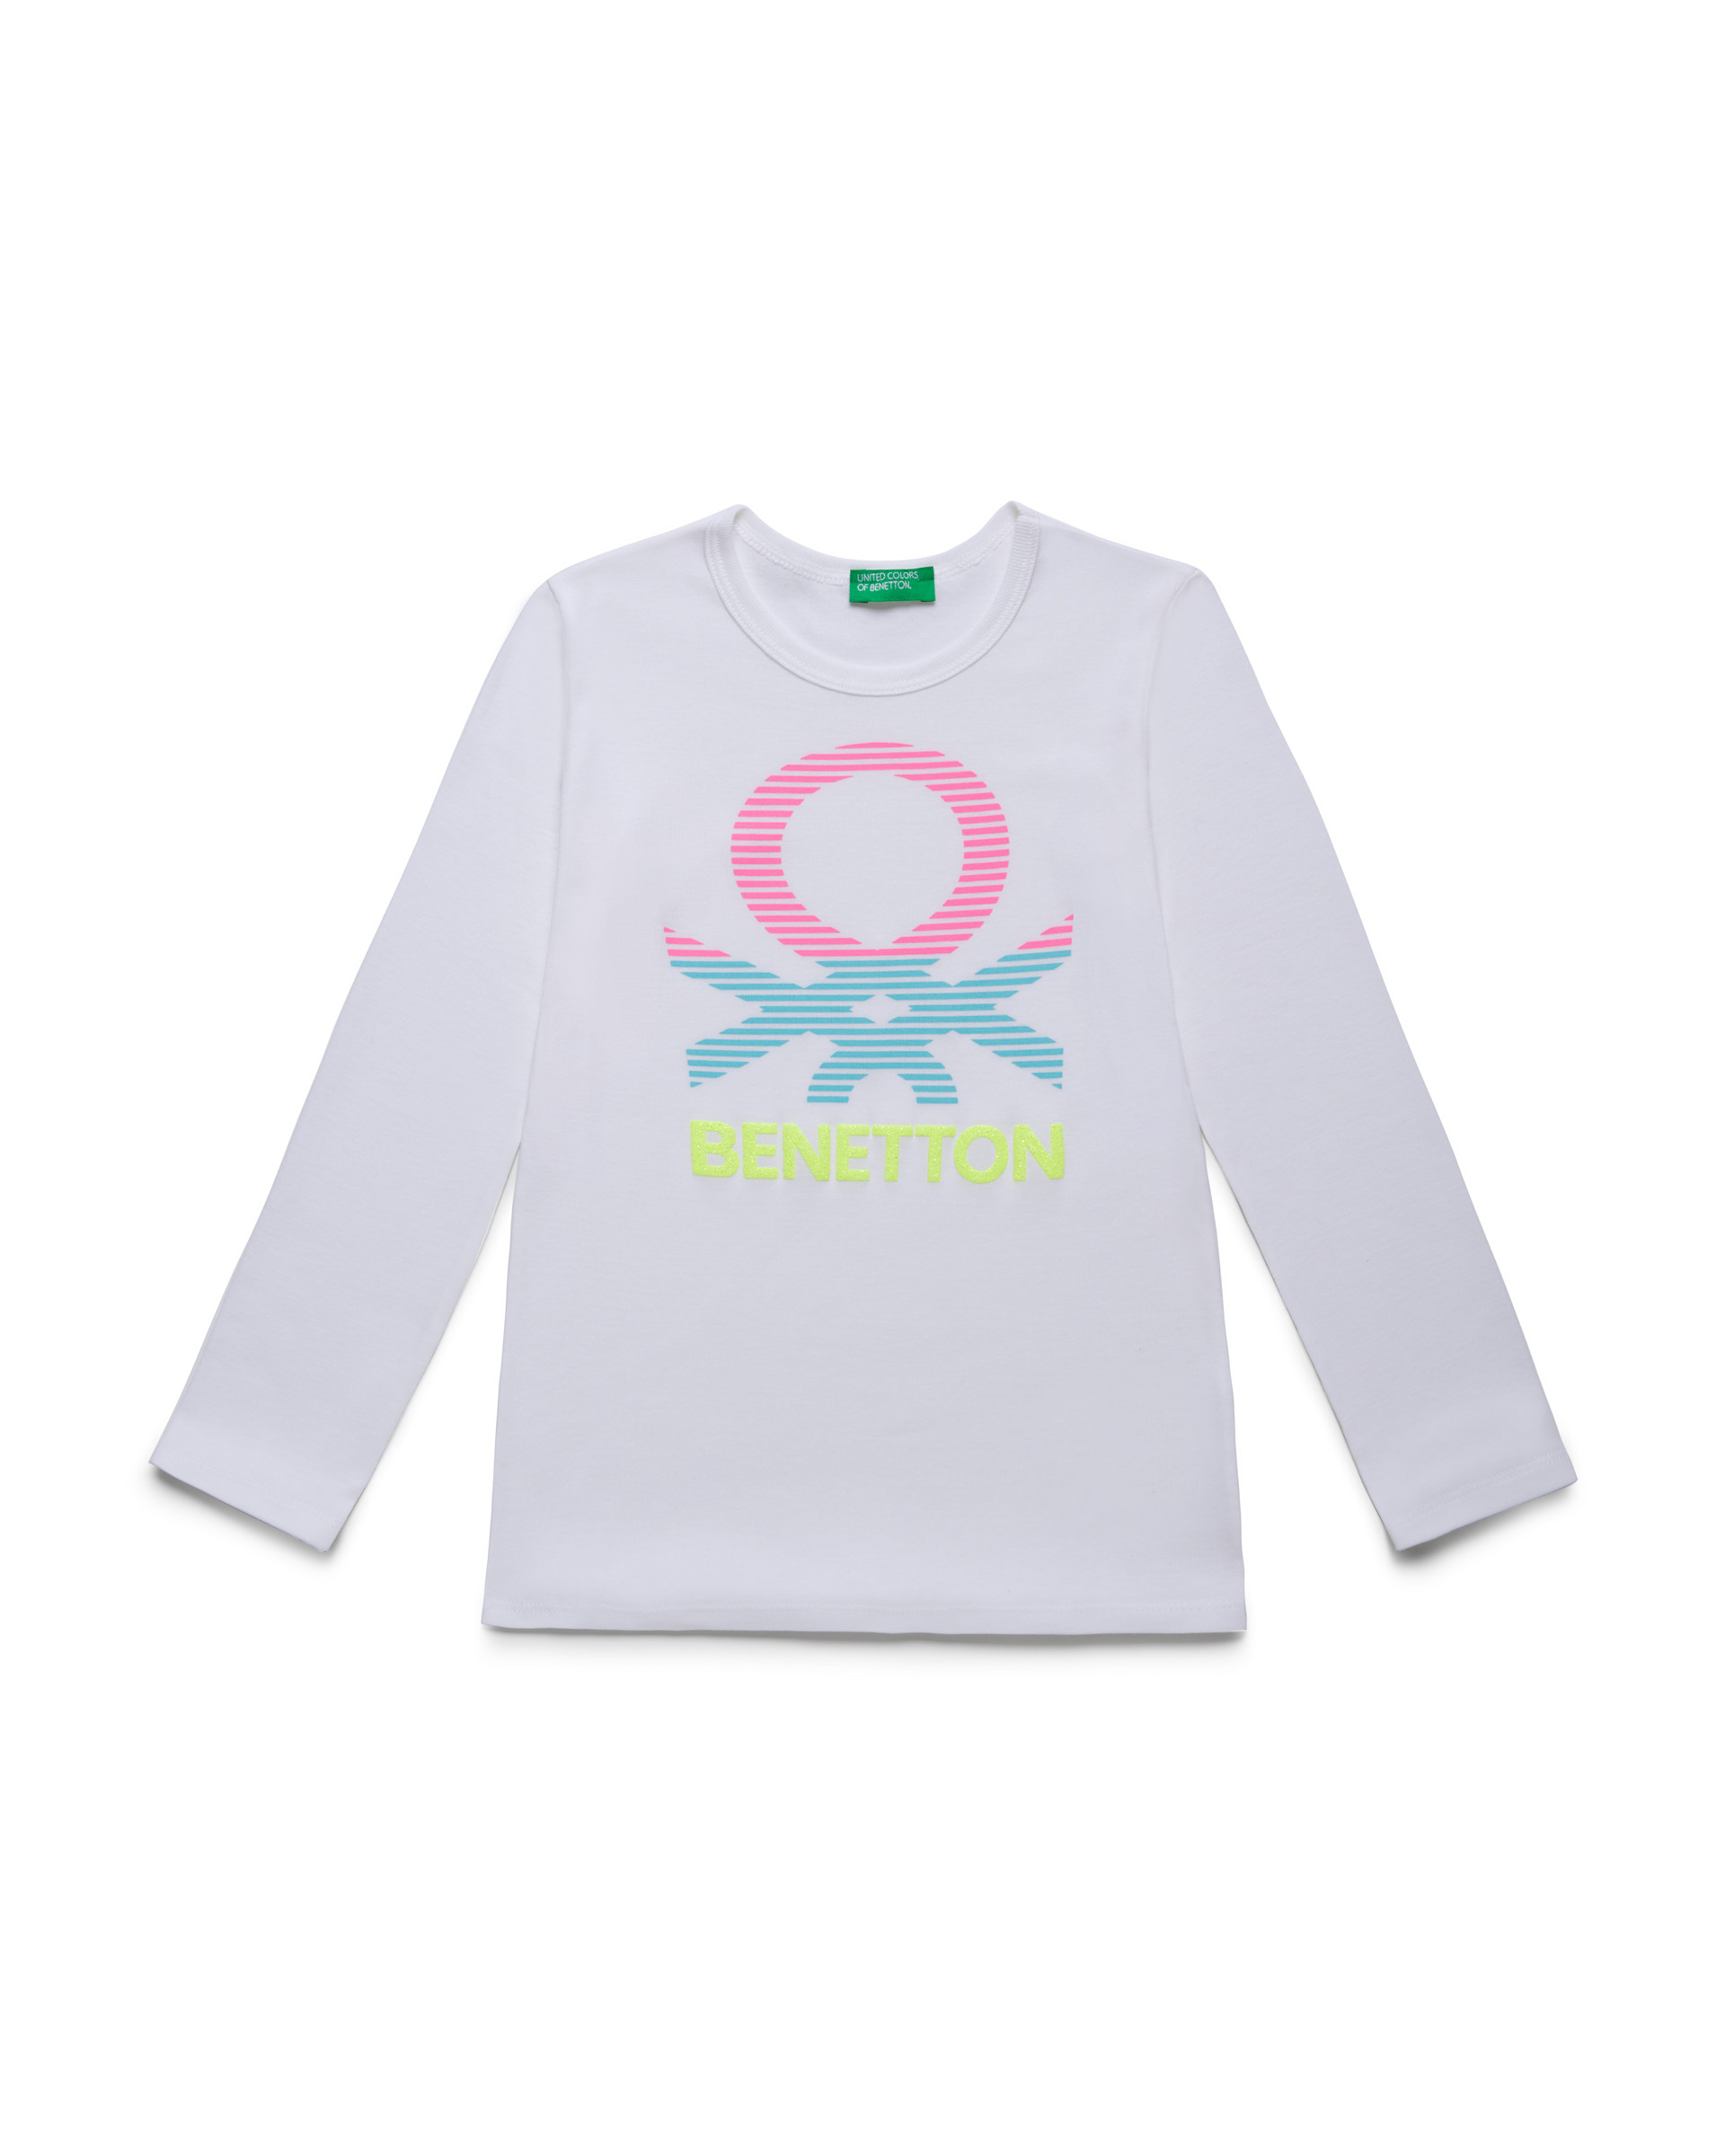 Купить 20P_3I9WC14J3_101, Футболка для девочек Benetton 3I9WC14J3_101 р-р 140, United Colors of Benetton, Футболки для девочек